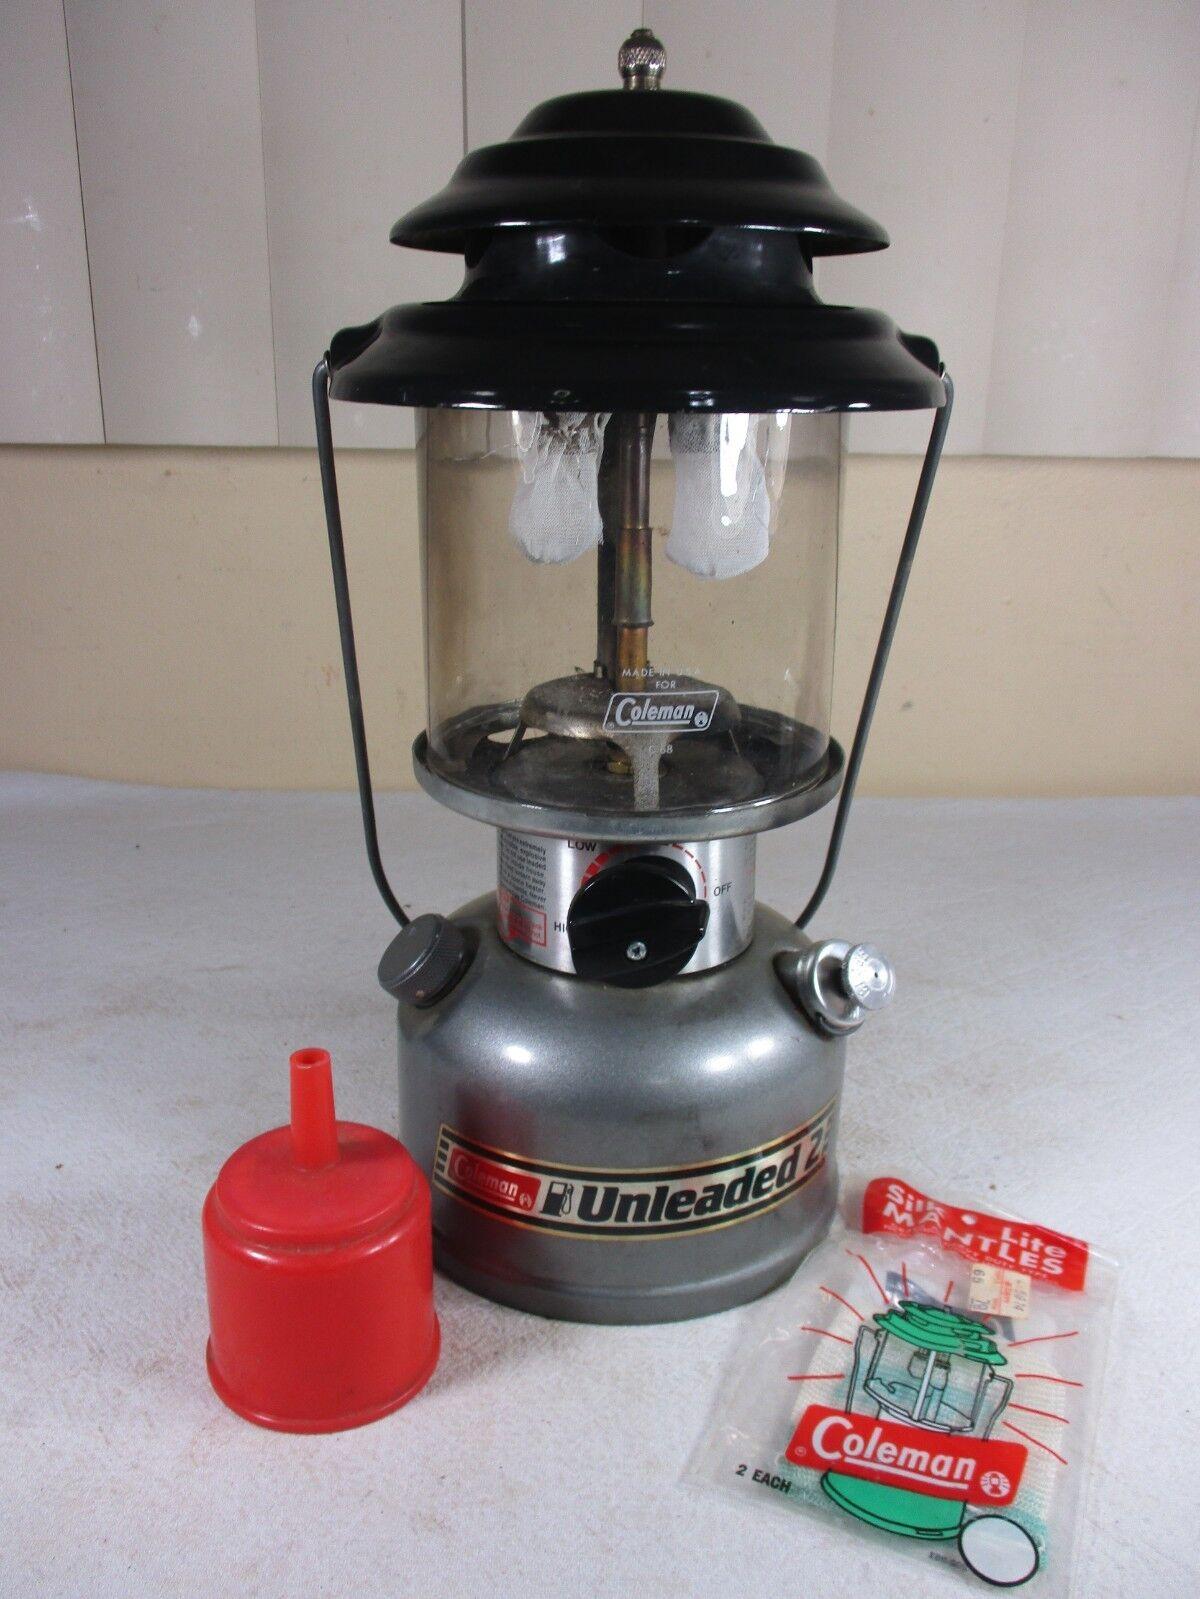 Vintage 1990 Coleman Model 285-700-2 Double Mantle Unleaded Funnel Gas Lantern & Funnel Unleaded e838a5